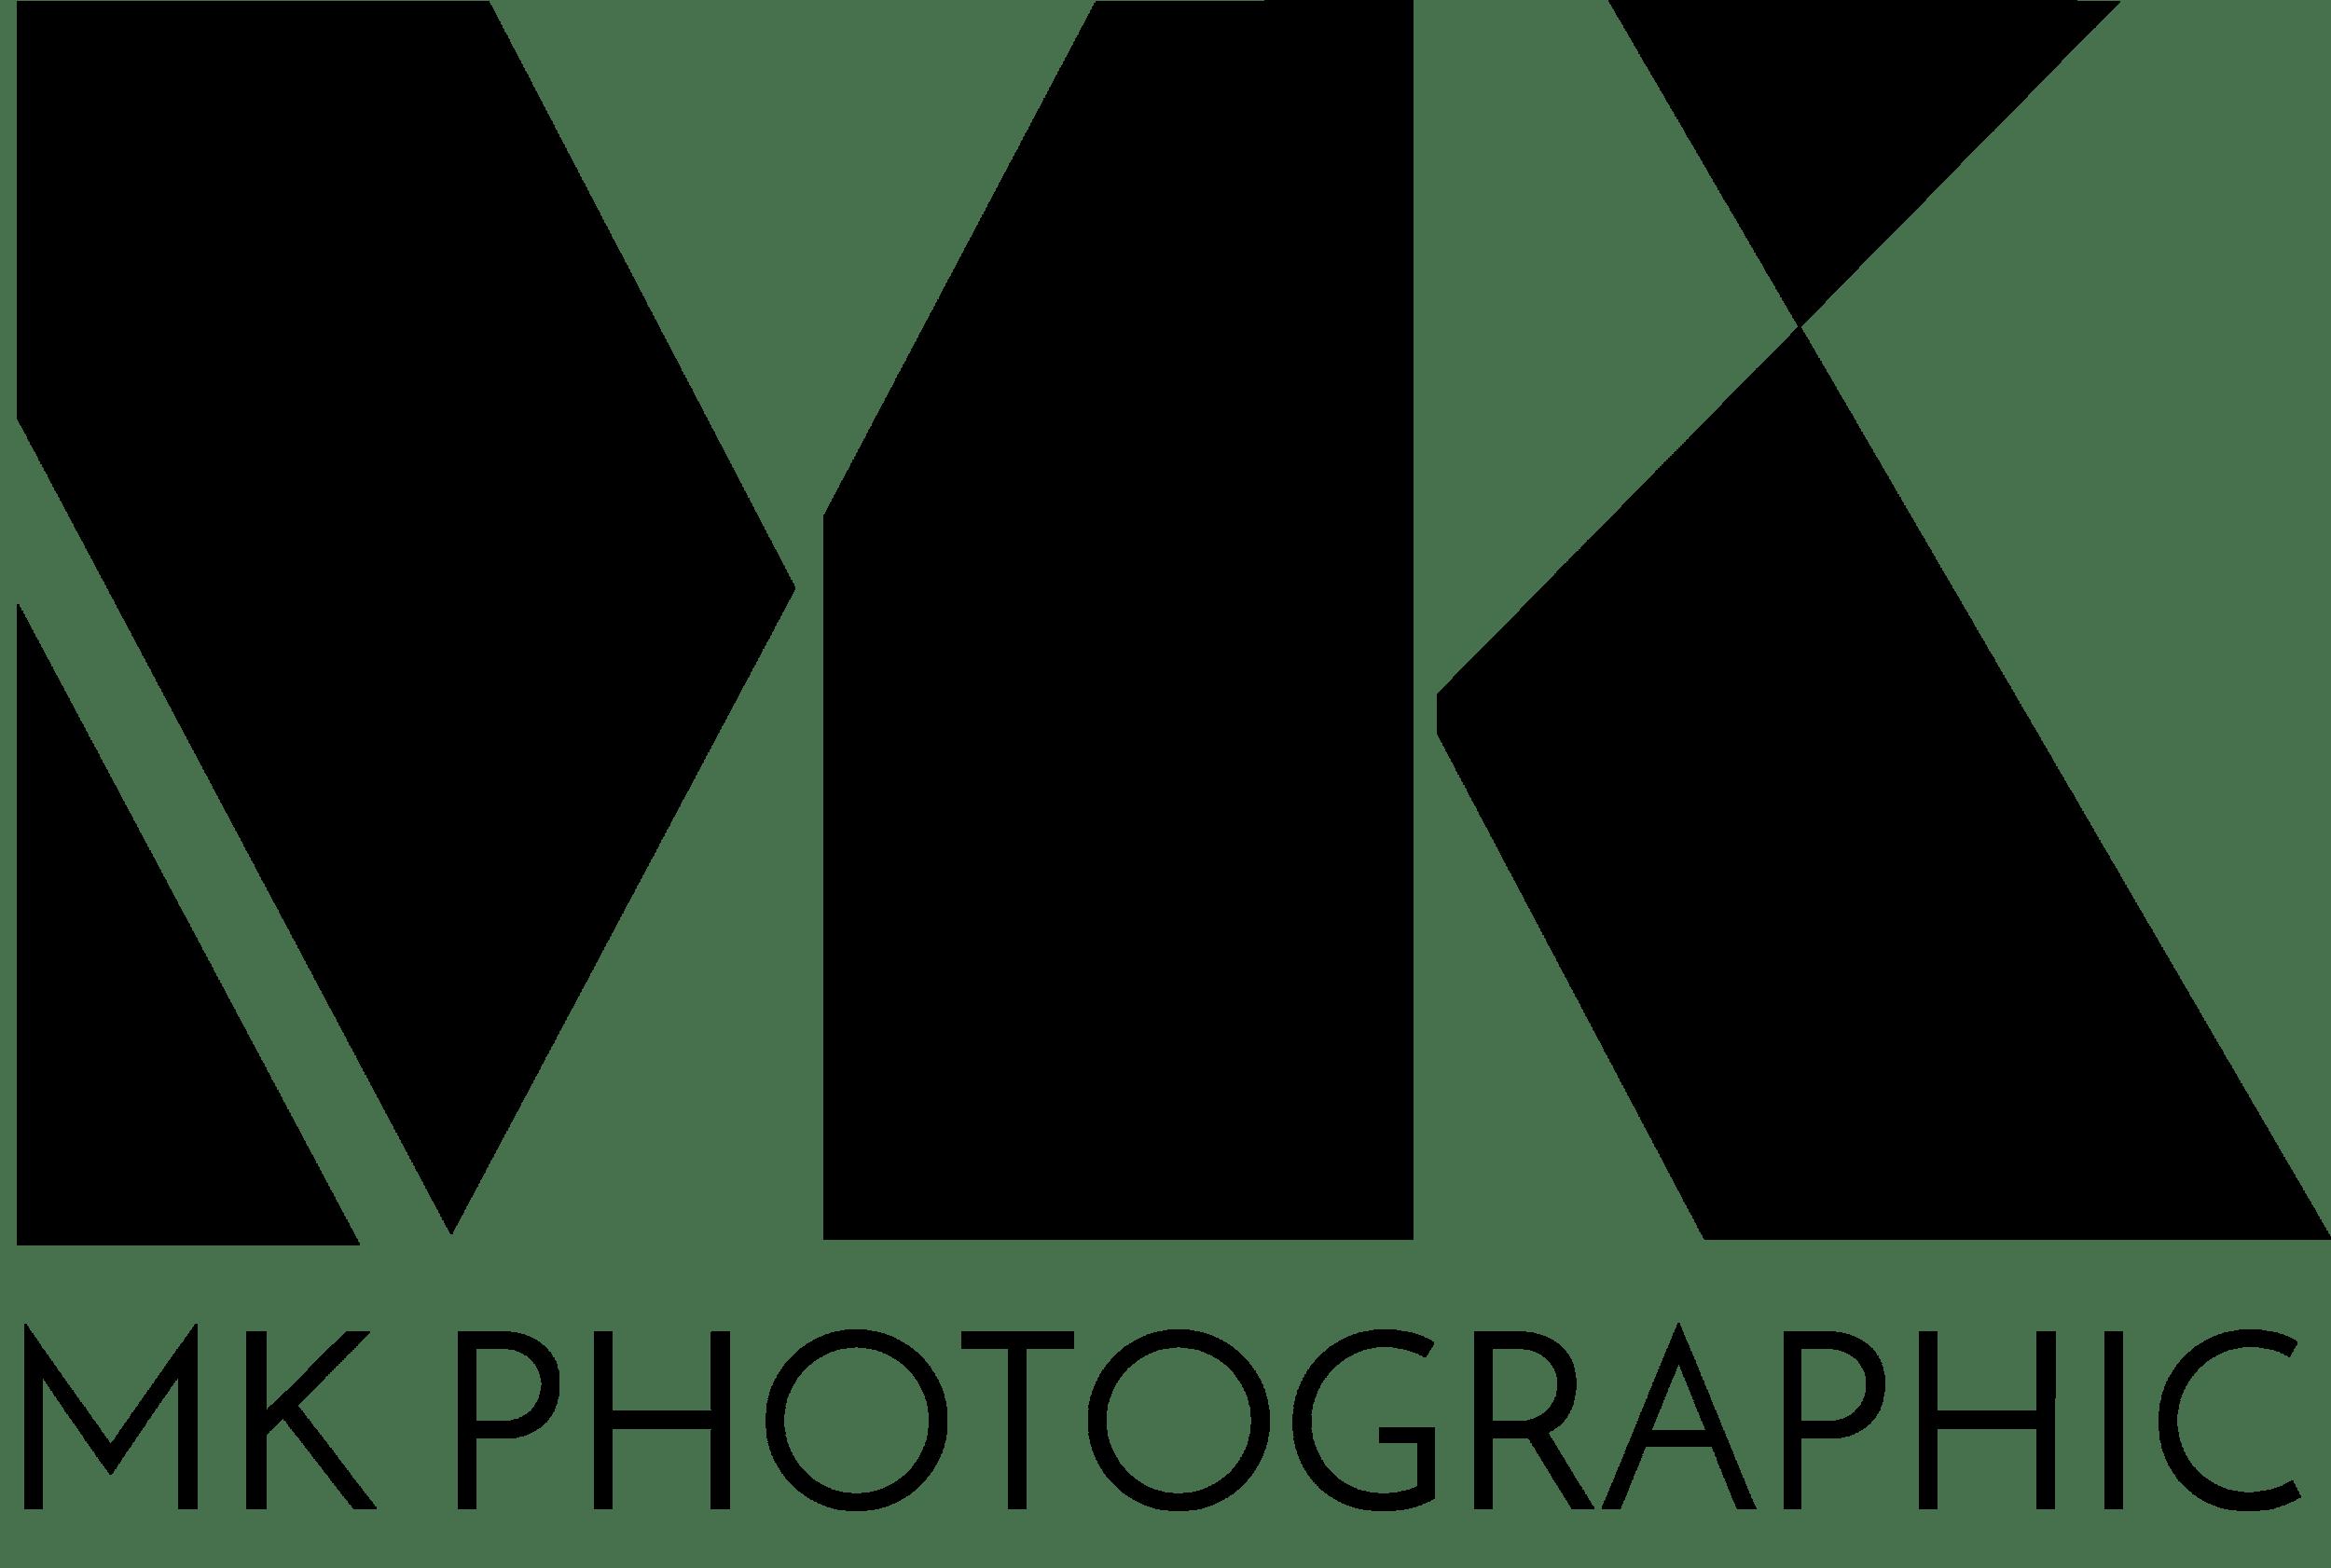 medium resolution of mk photographic llc